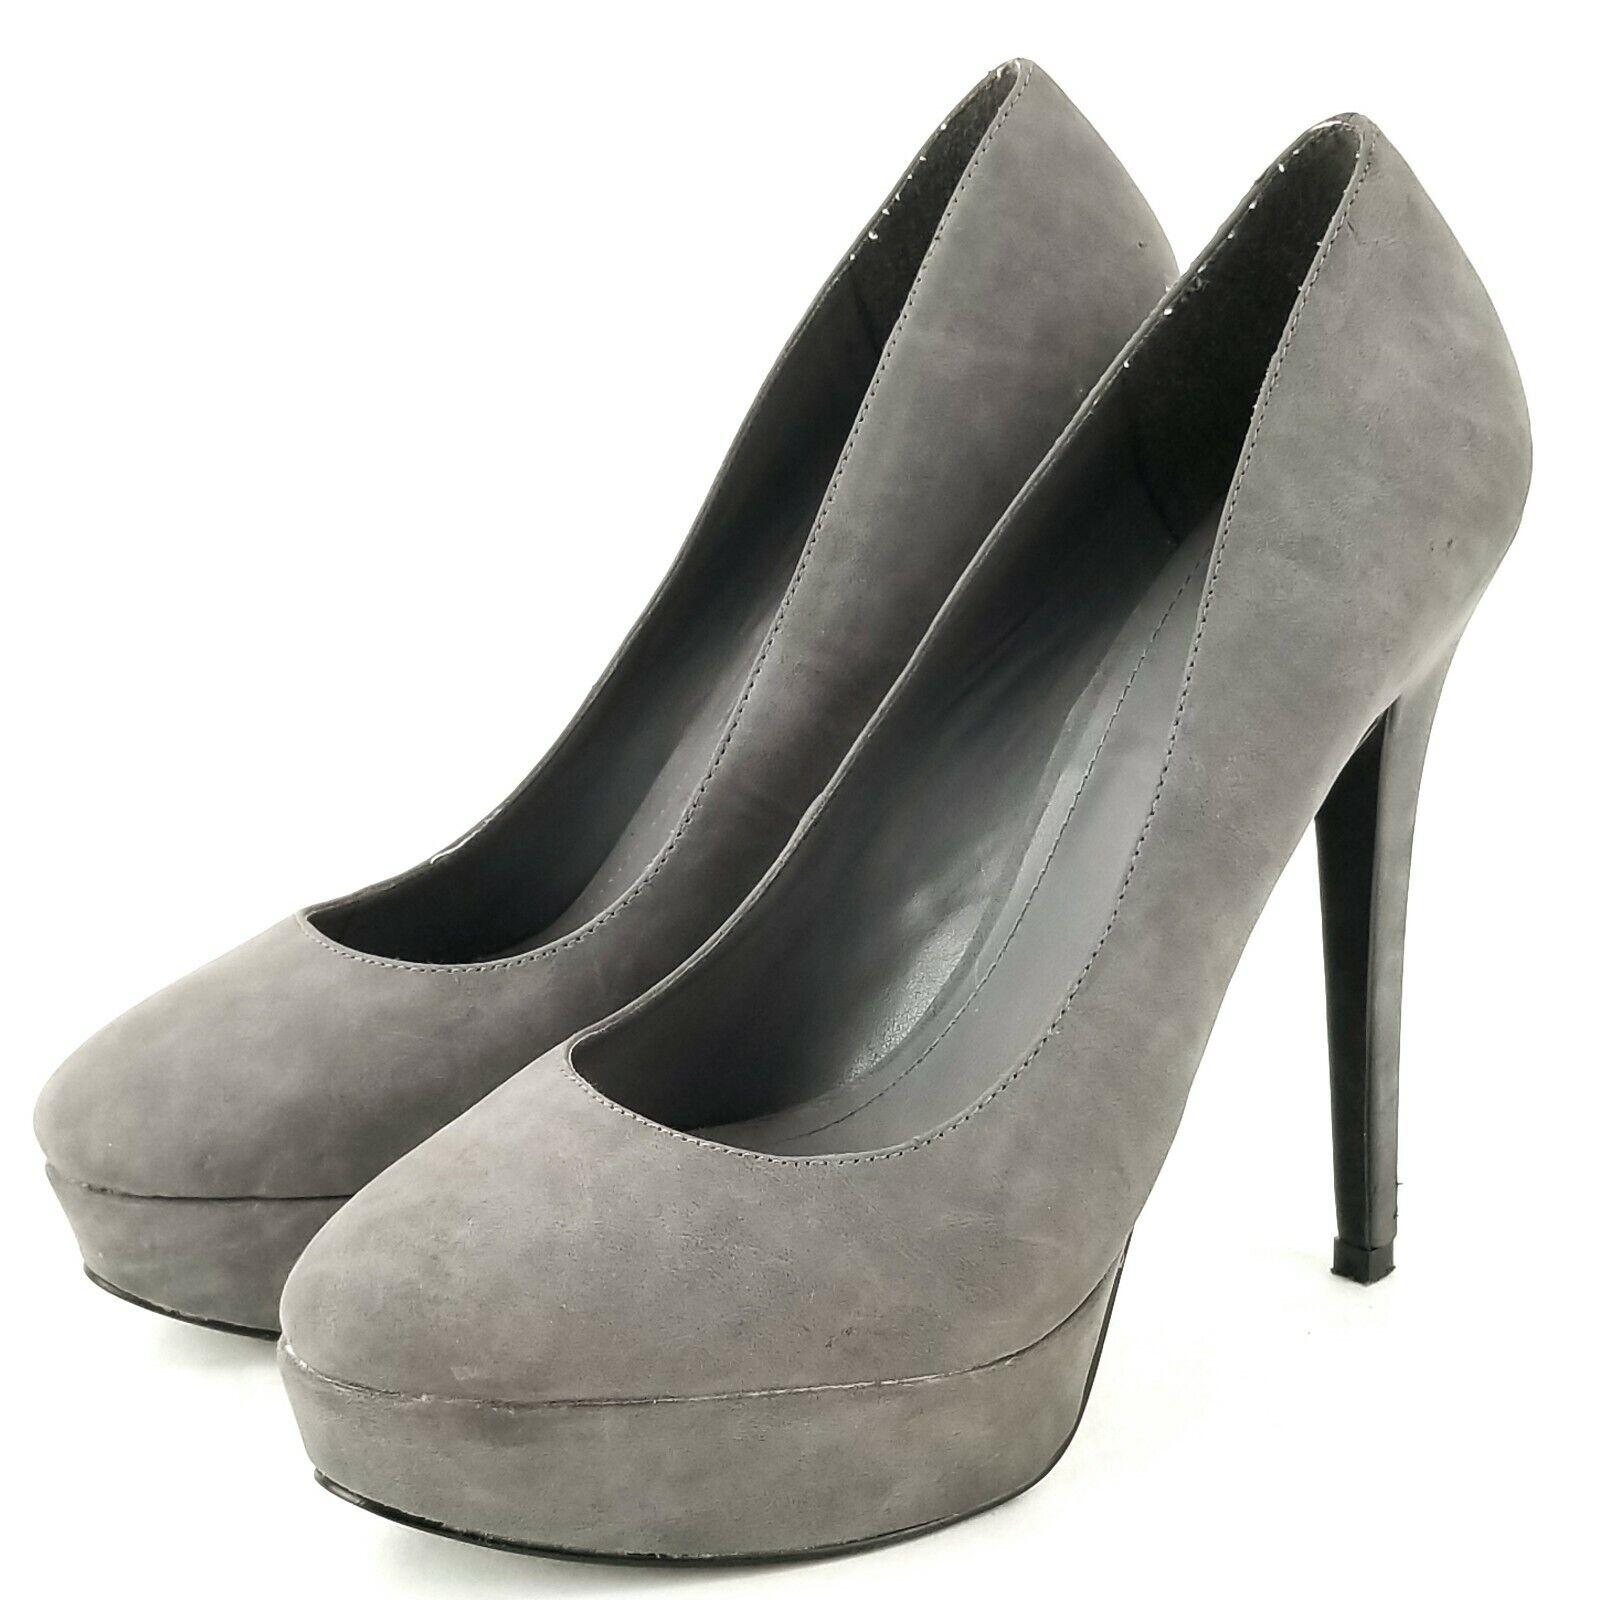 Aldo Stiletto Heels Womens Gray Suede Leather Pumps Platform EU 39 / US 8.5